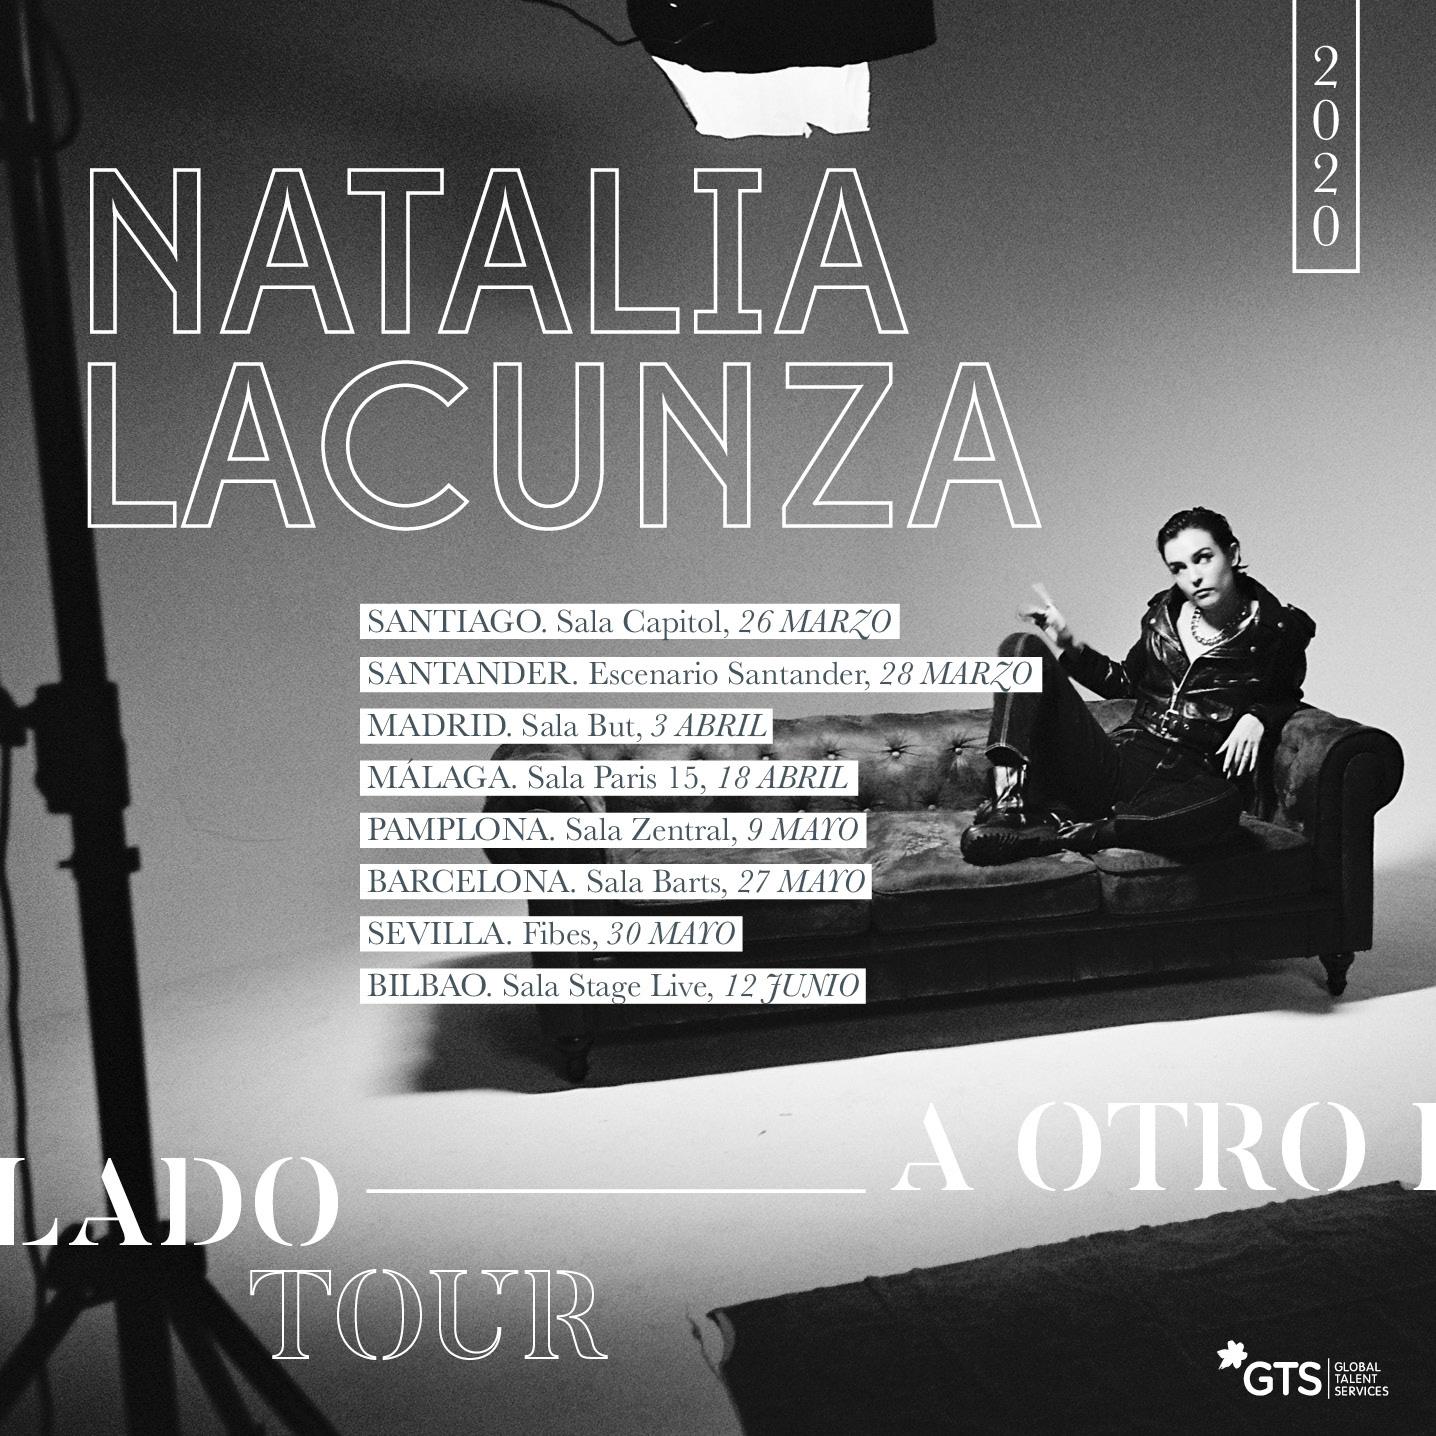 GTS-Natalia-Lacunza-rrss